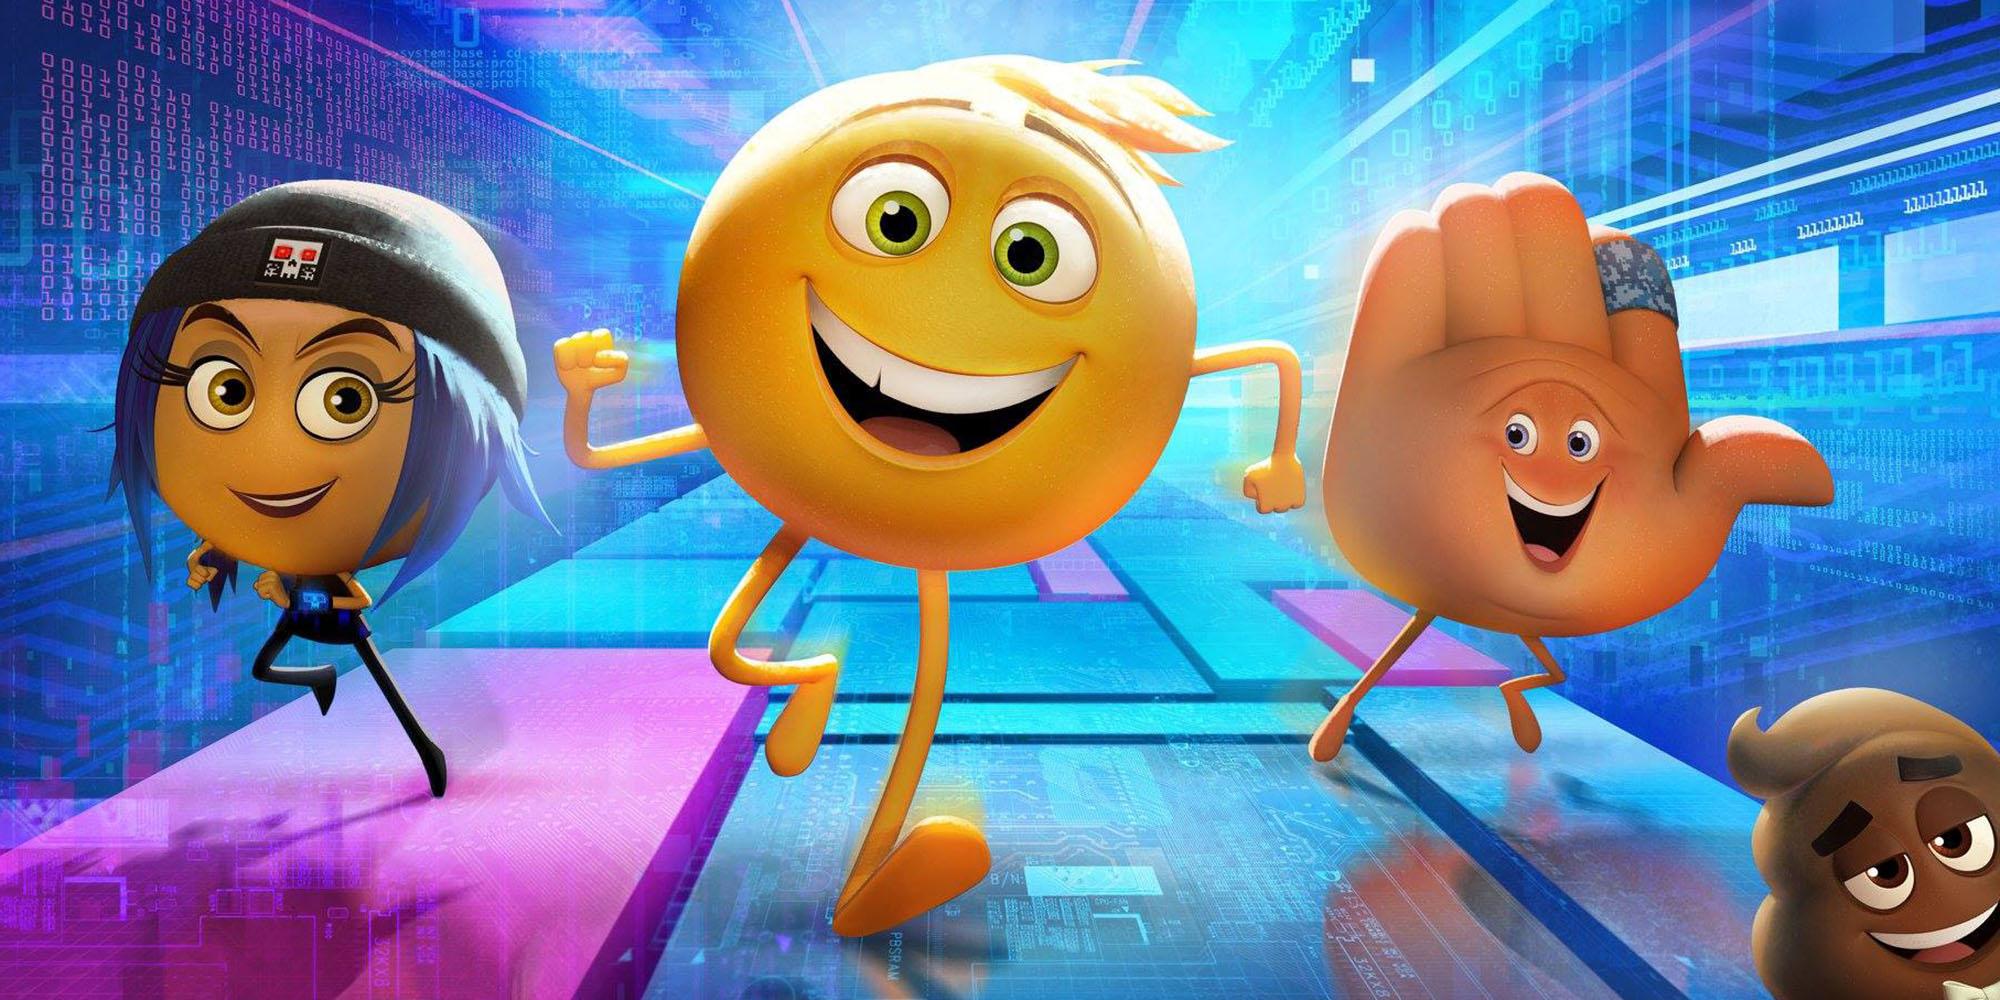 emoji-movie-still-sony-1476125868.jpg (382.52 Kb)